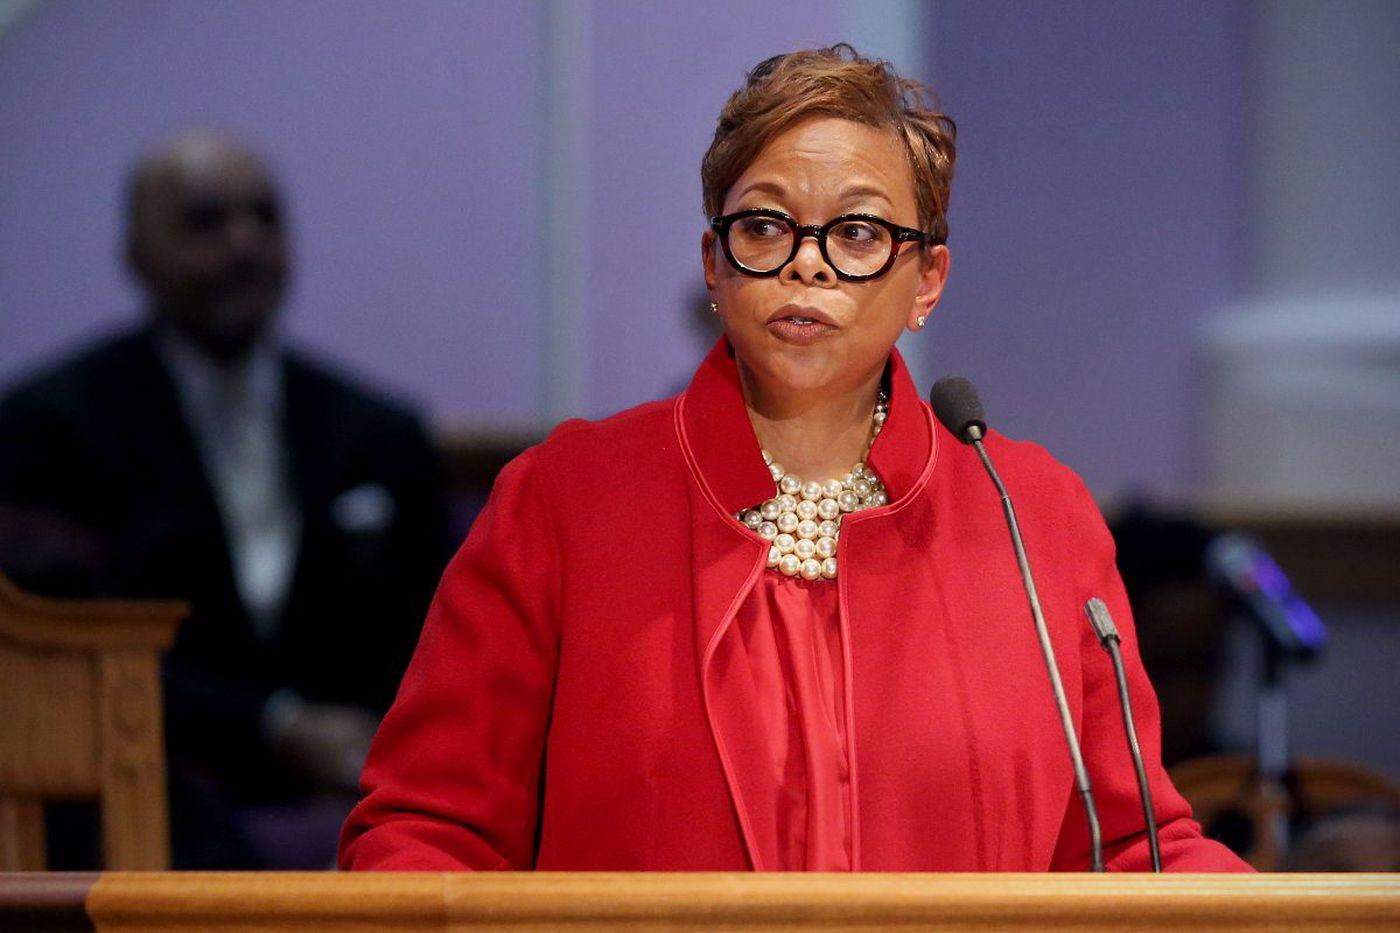 Former Camden Mayor Redd gets lucrative university board post